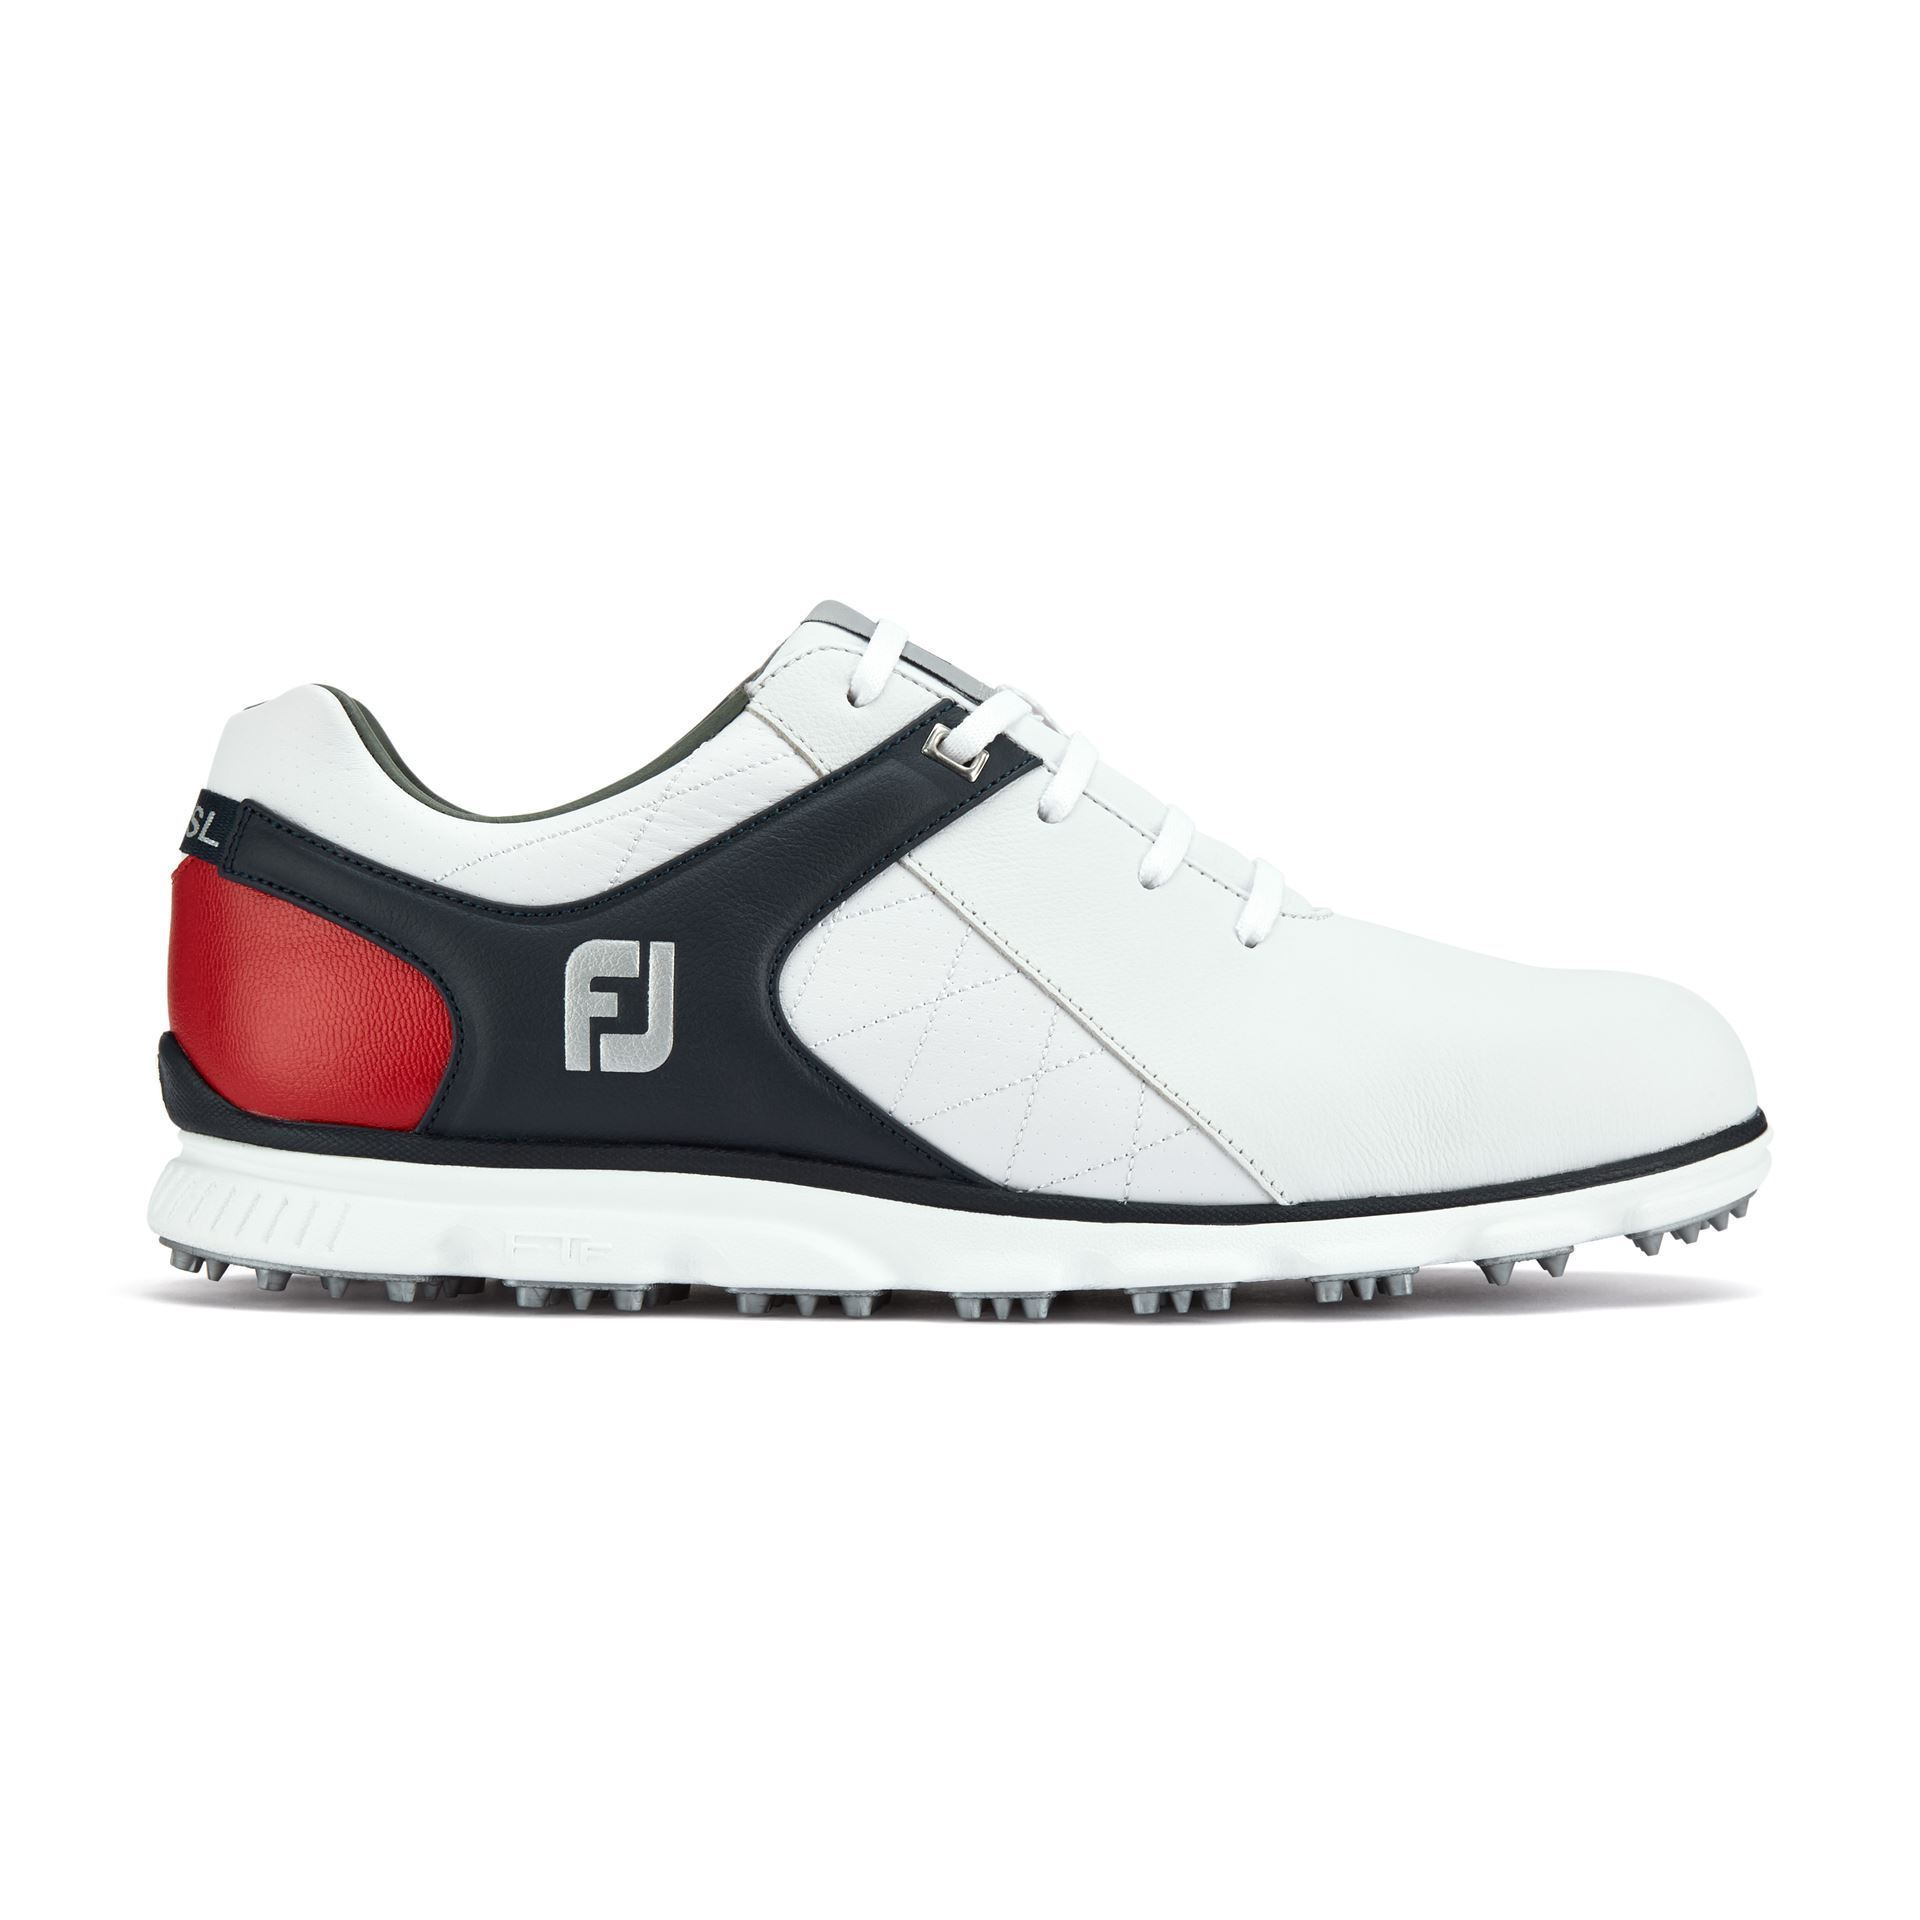 Footjoy Pro SL Golf Shoes 53496